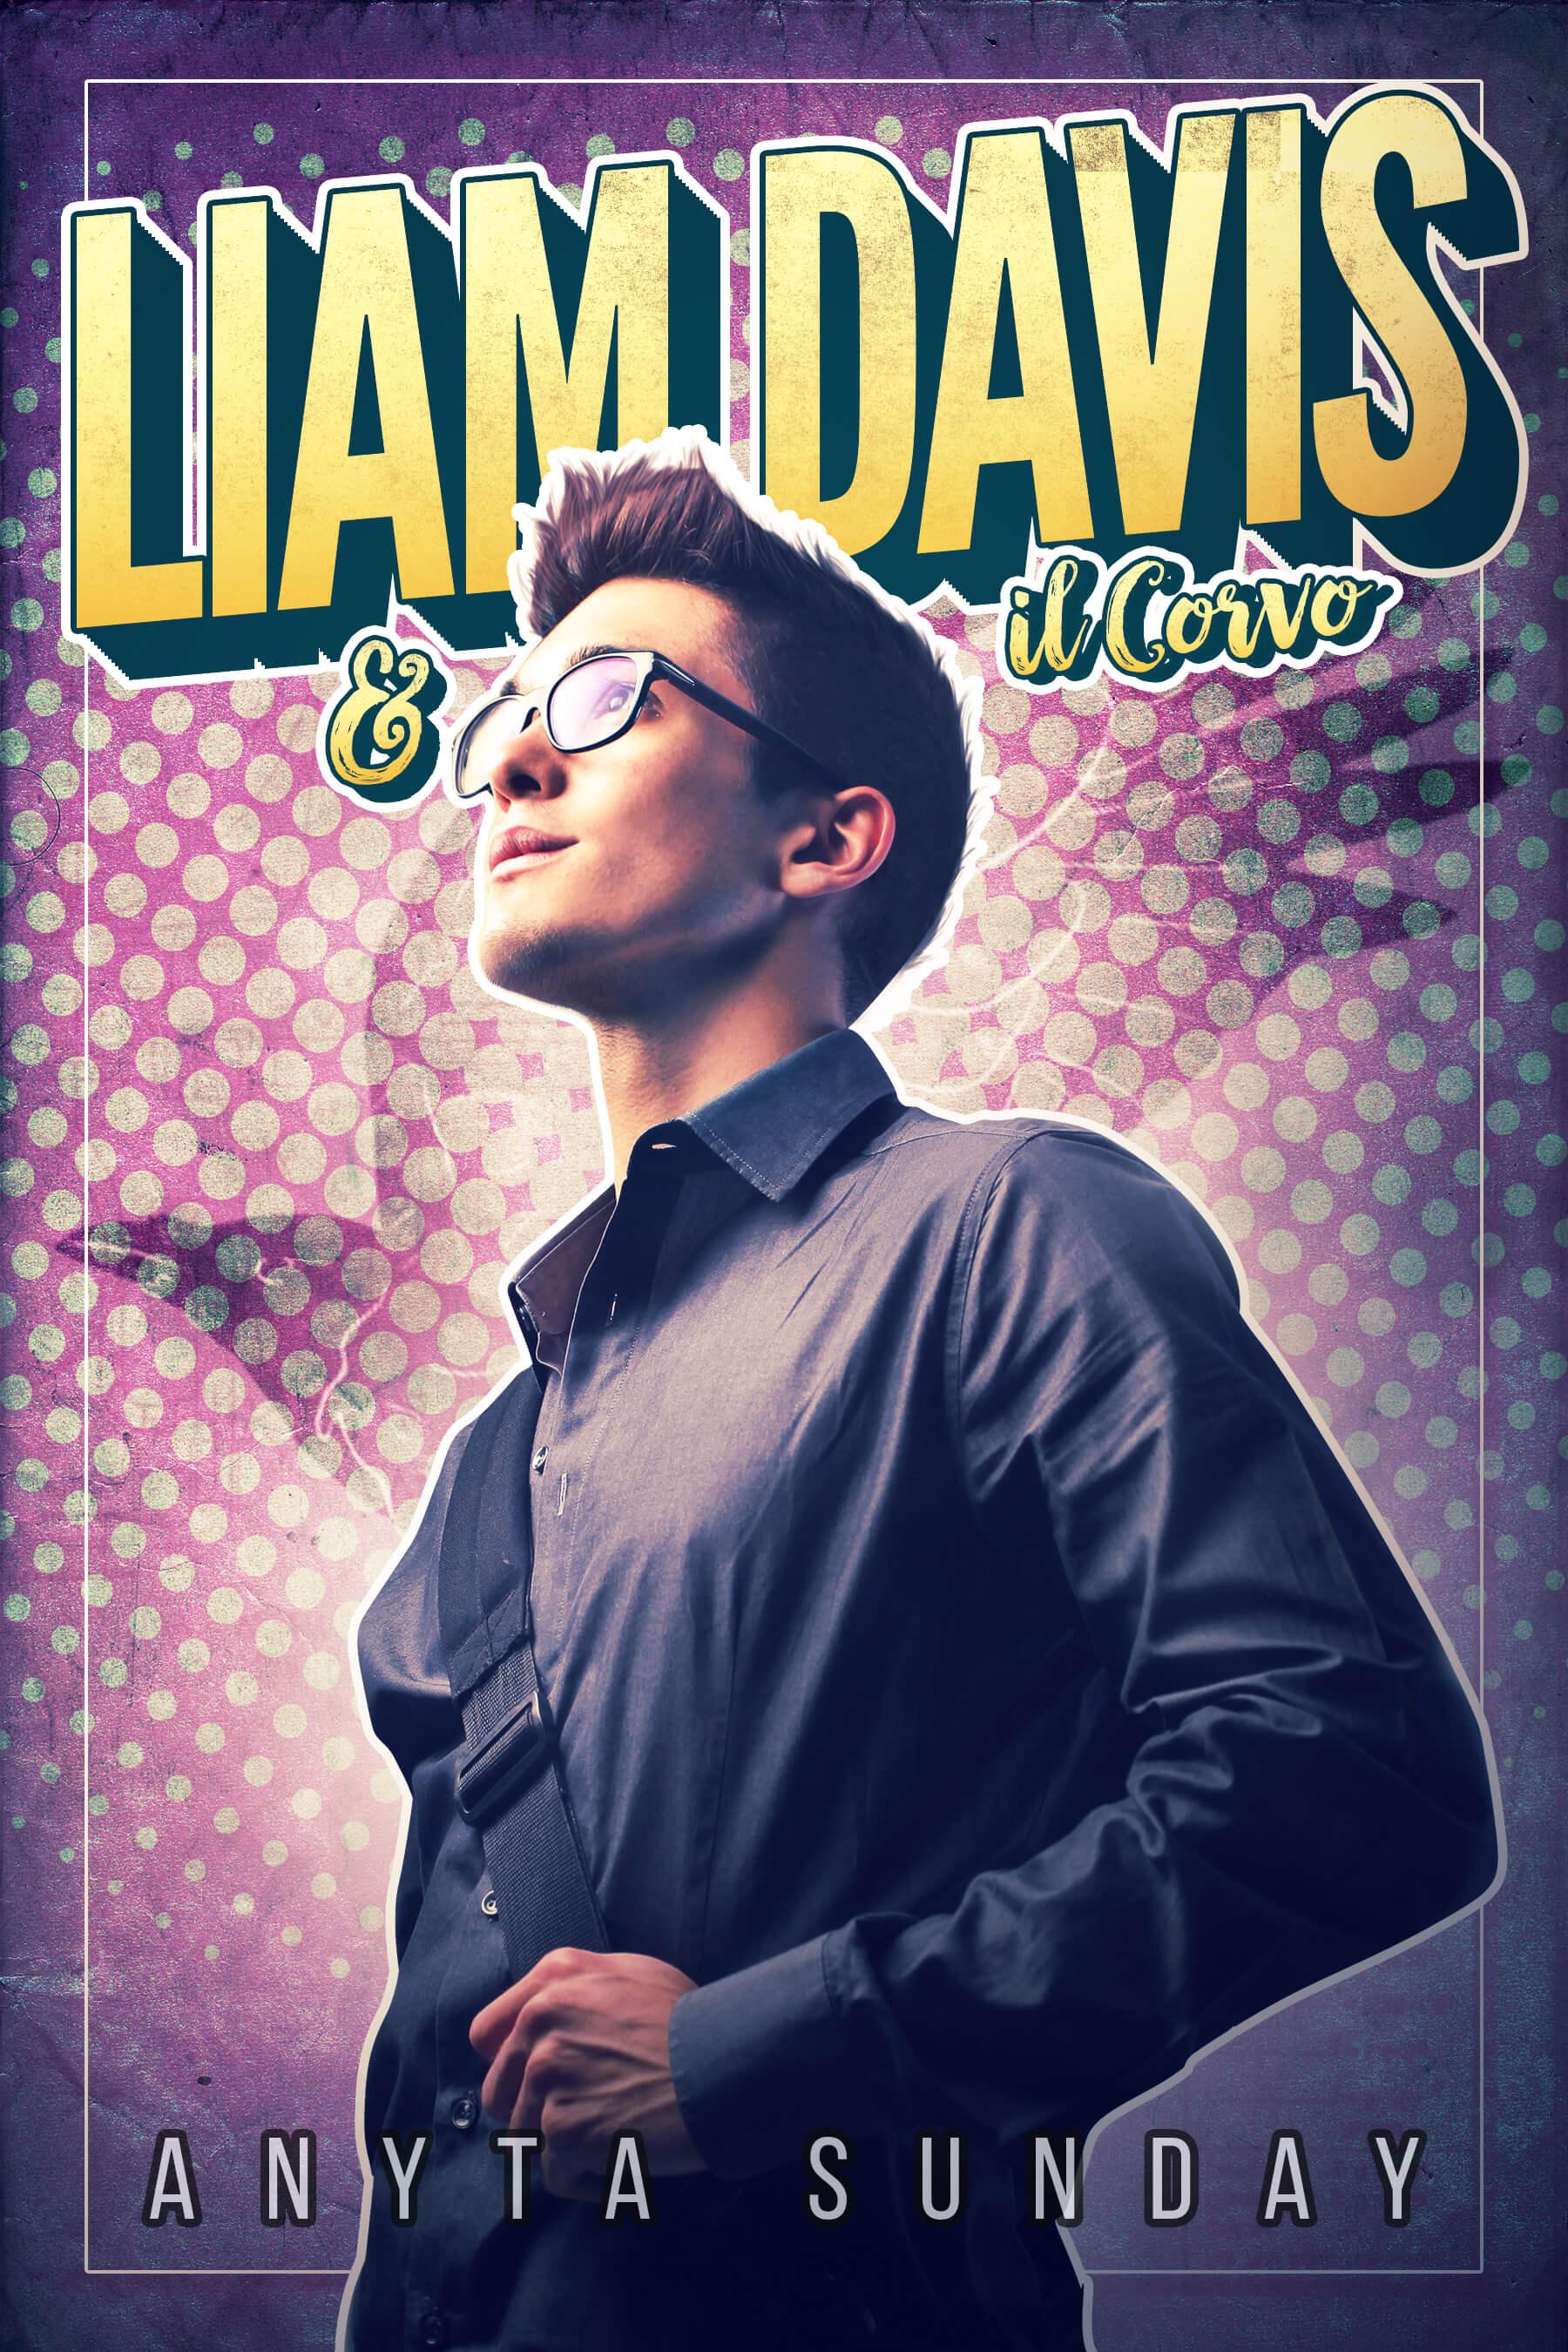 Liam Davis e il Corvo Anyta Sunday Gay Romance